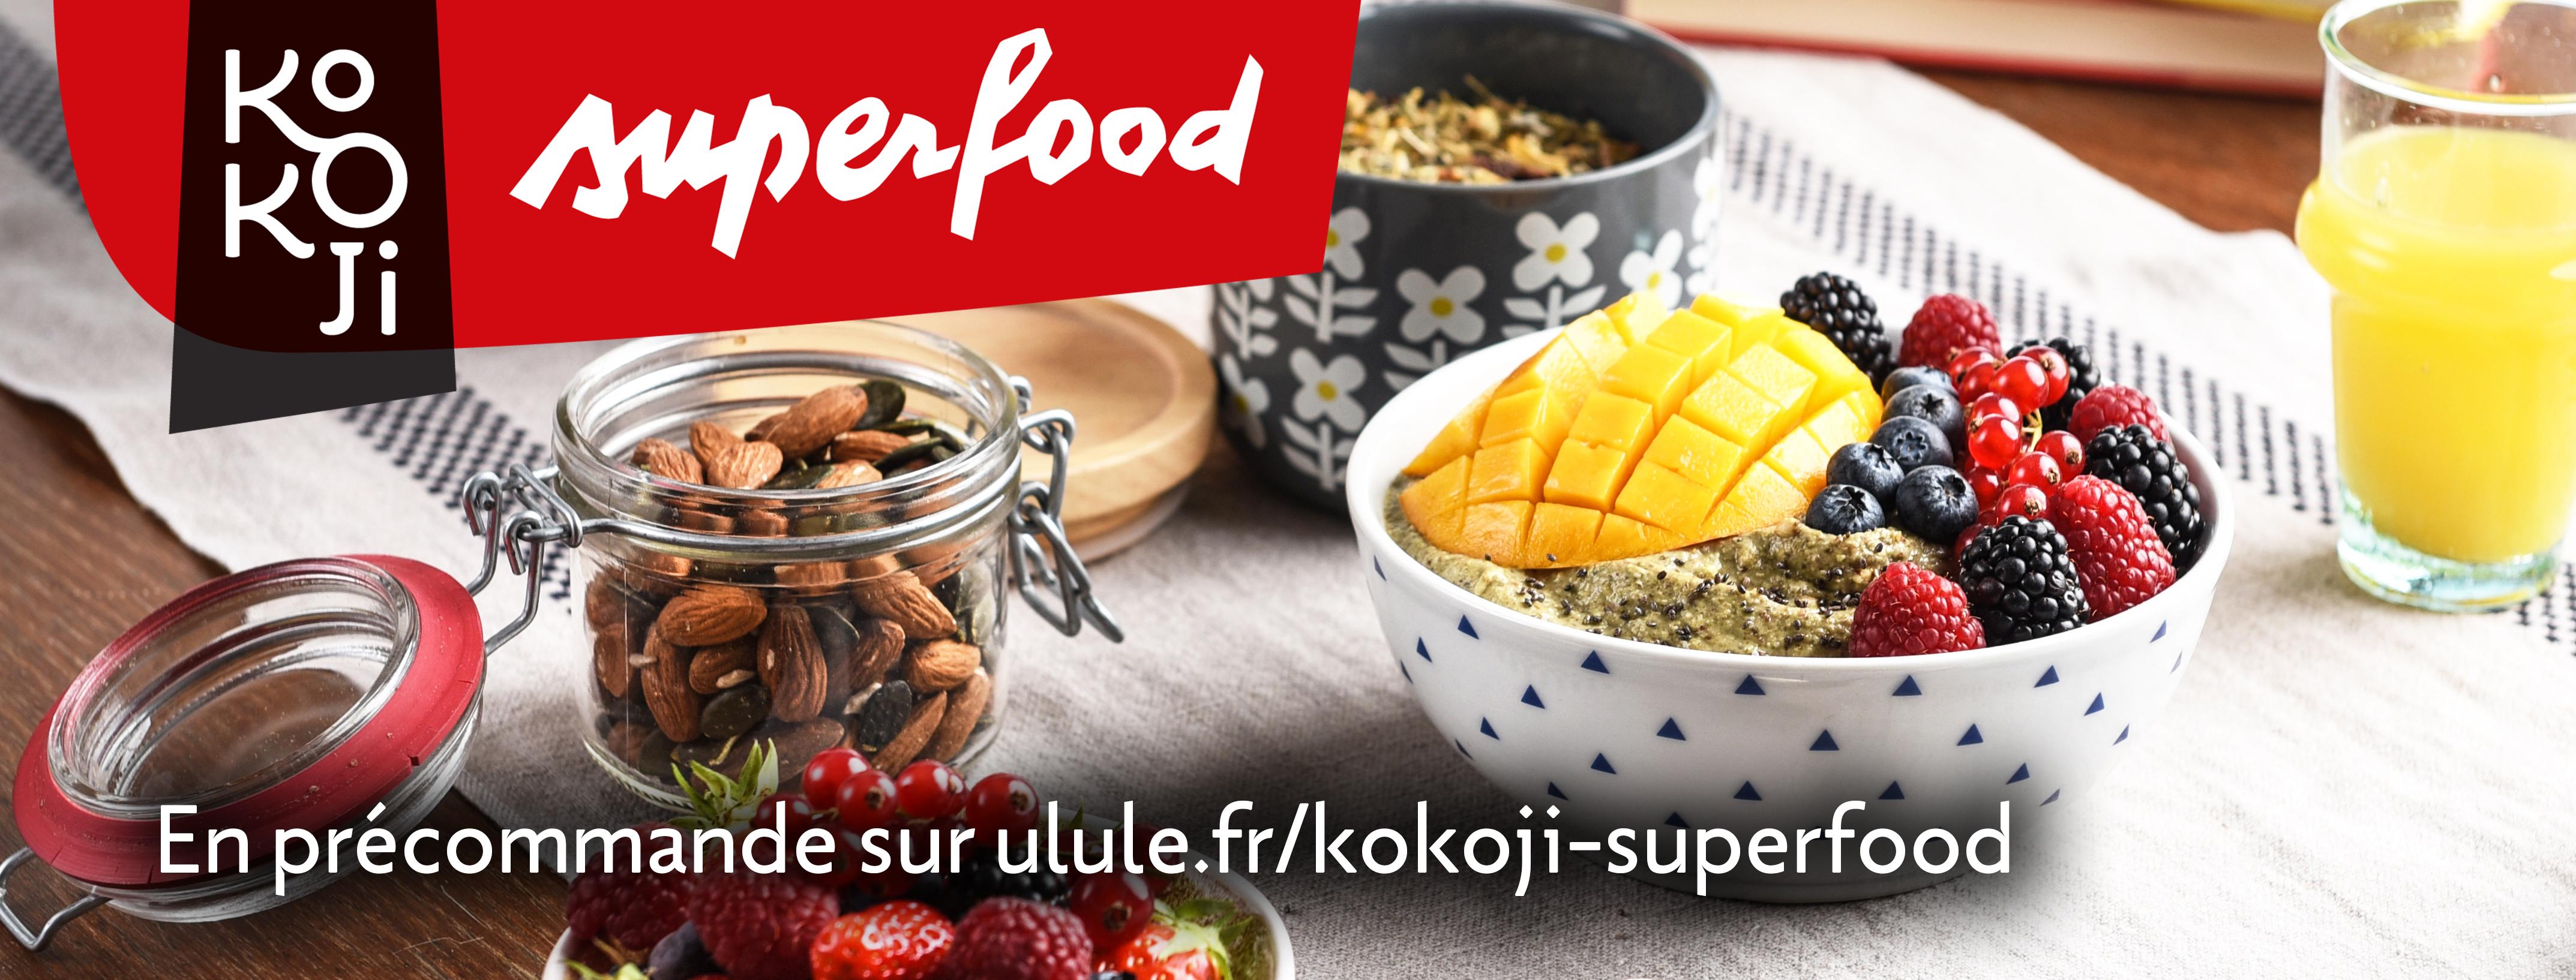 cbhfcbikoamchjfk - Kokoji lance sa gamme de porridges aux superaliments français